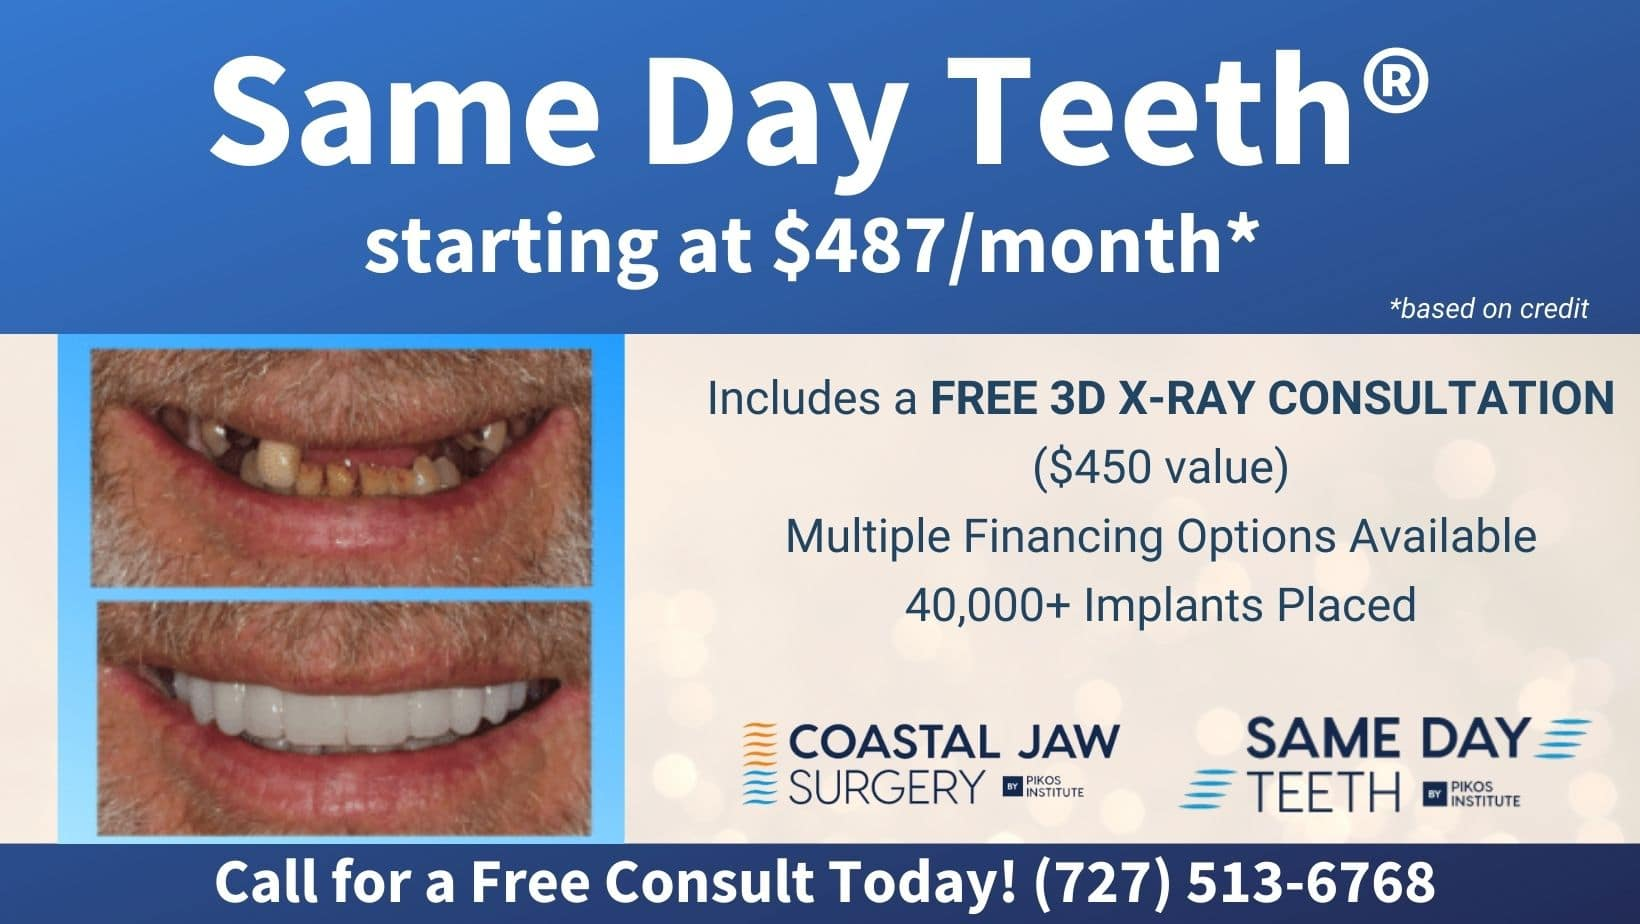 Same Day Teeth Starting at $487 per month